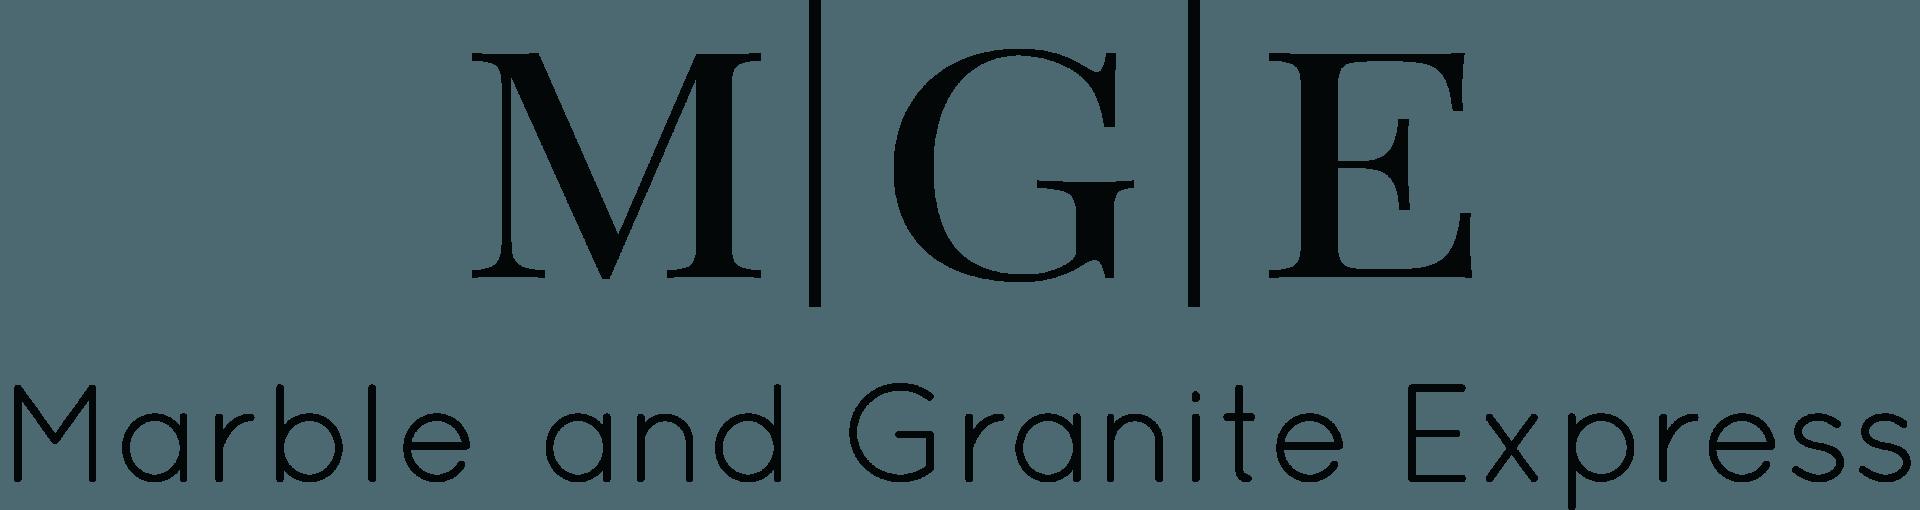 Marble & Granite Express Offers Premier Grade Detroit Granite Countertops